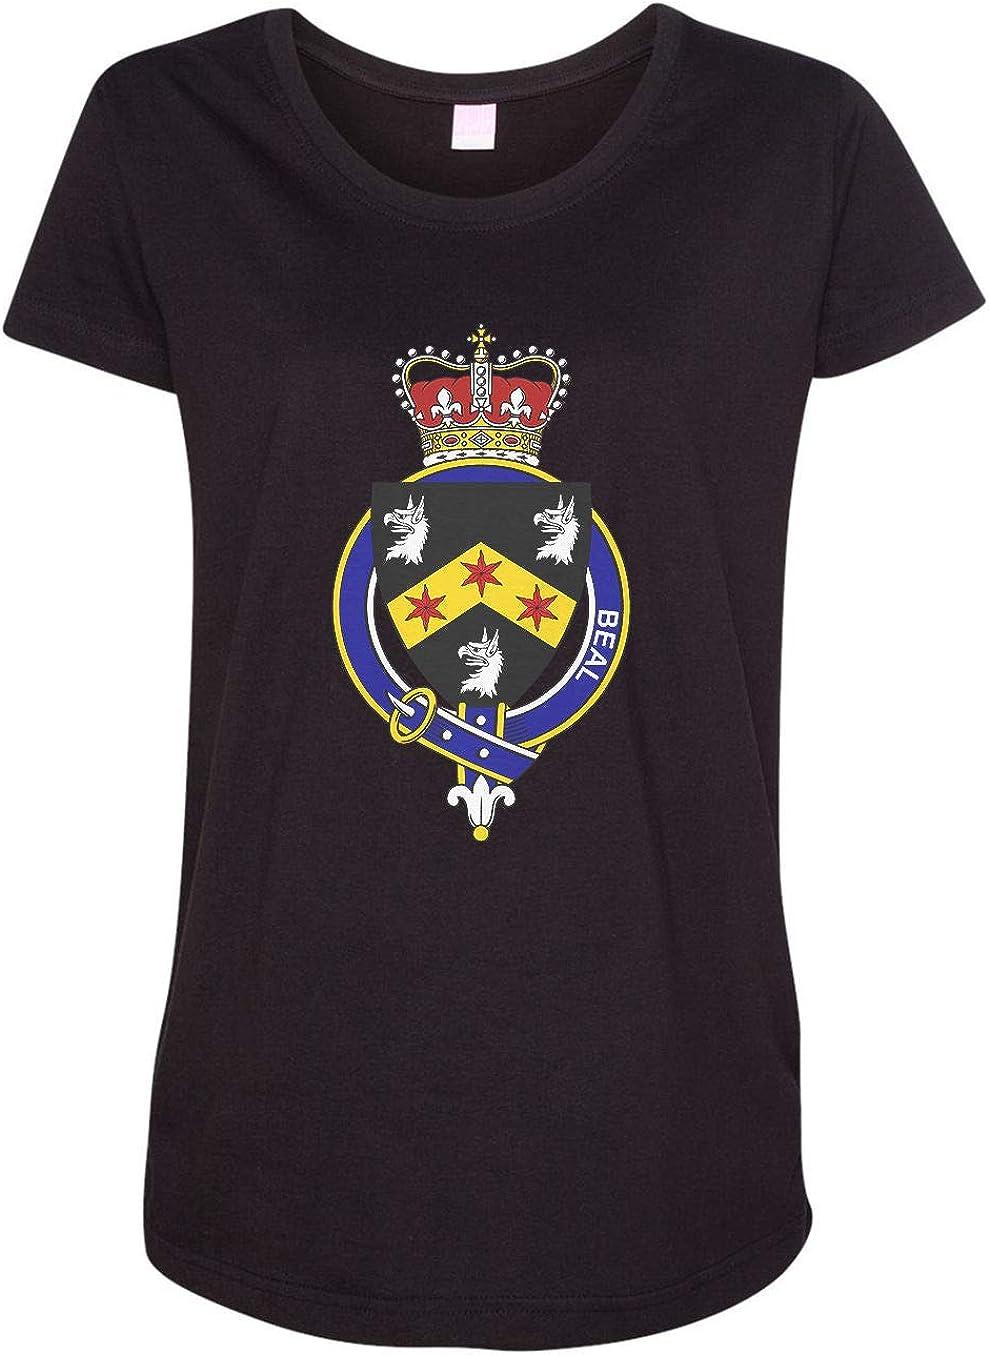 HARD EDGE DESIGN Women's English Garter Family Beal T-Shirt